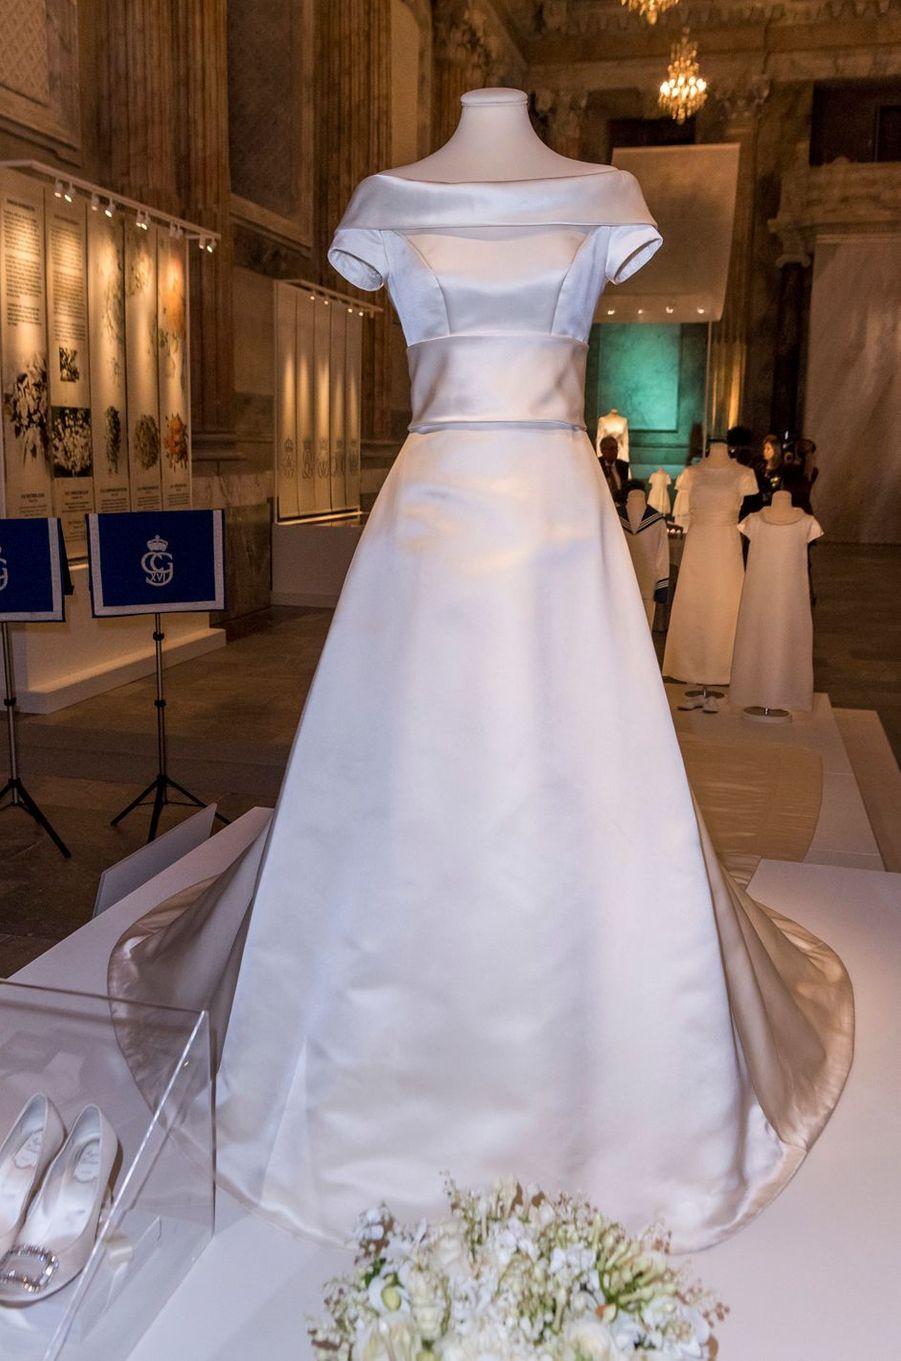 La robe de mariée de la princesse Victoria de Suède, exposée à Stockholm, le 17 octobre 2016